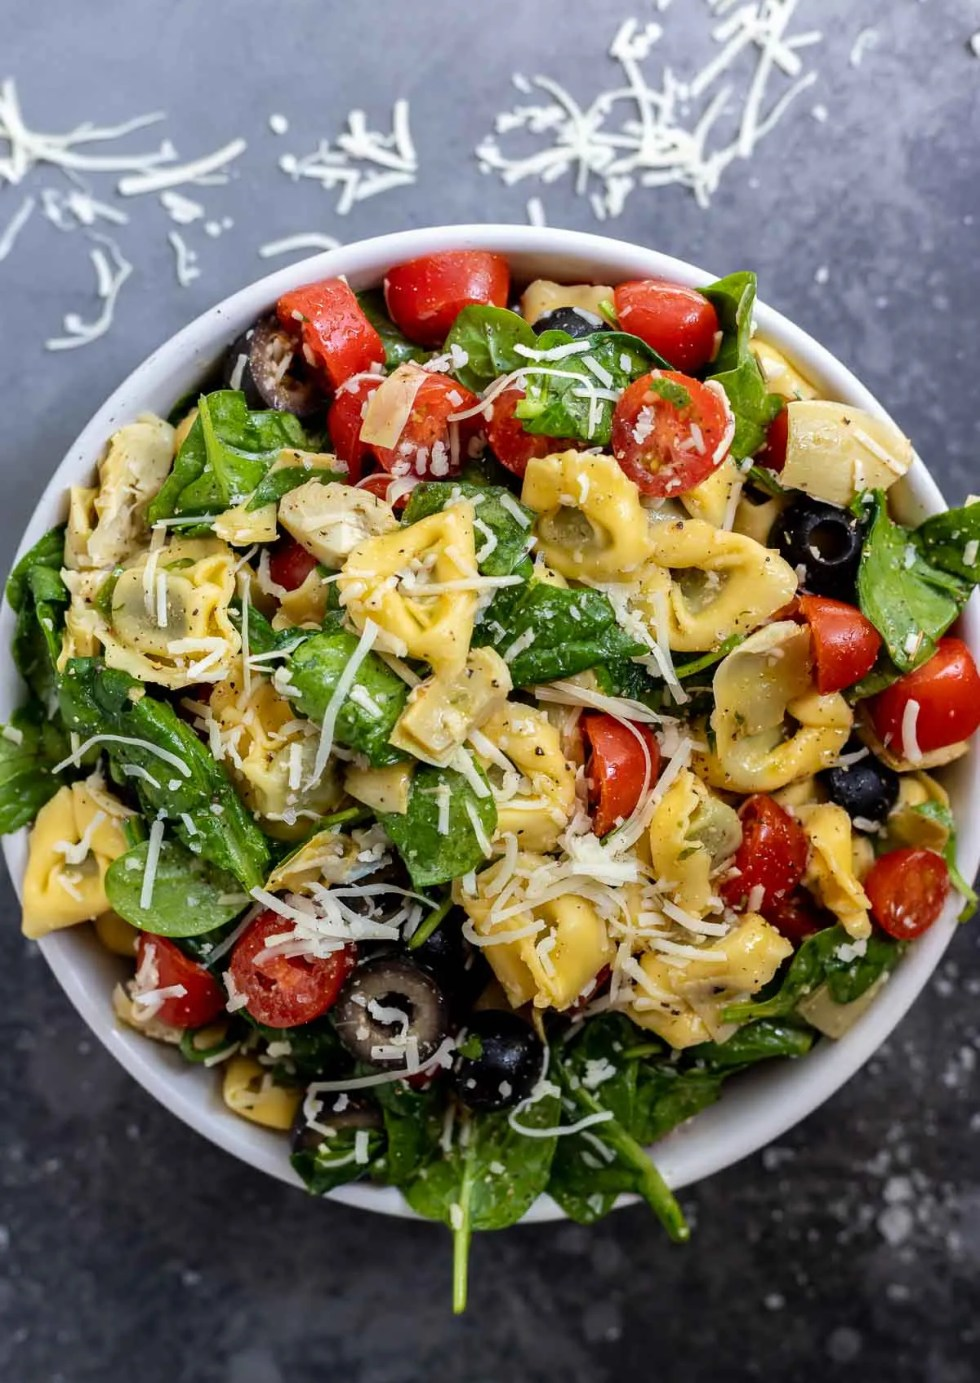 Italian tortellini salad in white bowl